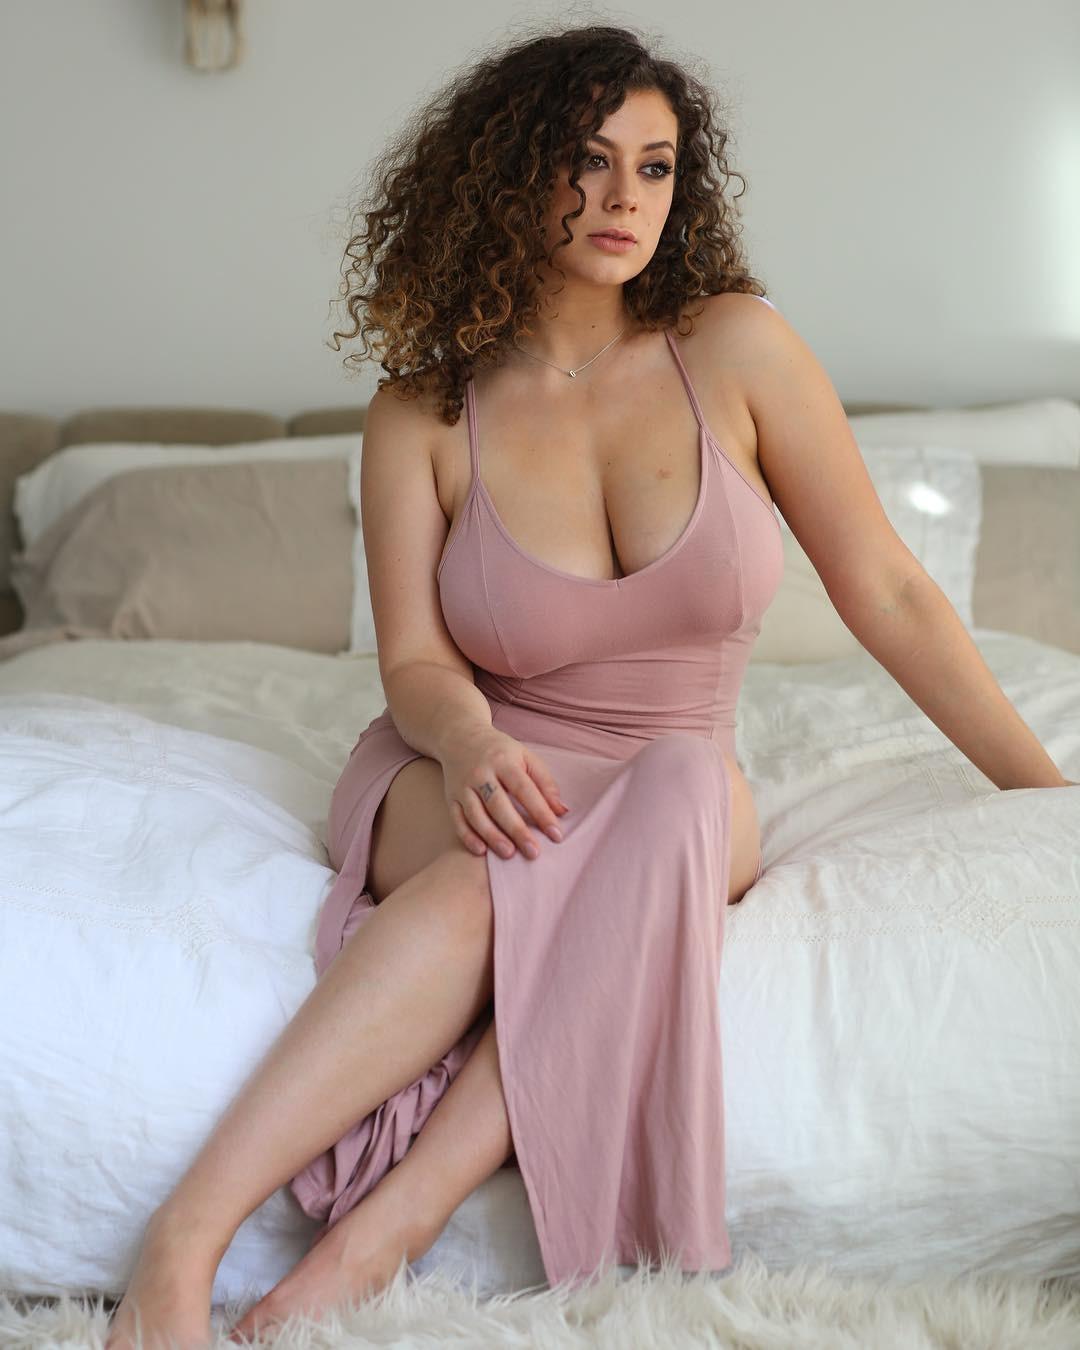 Leila Lowfire Desnuda Página 3 Fotos Desnuda Descuido Topless